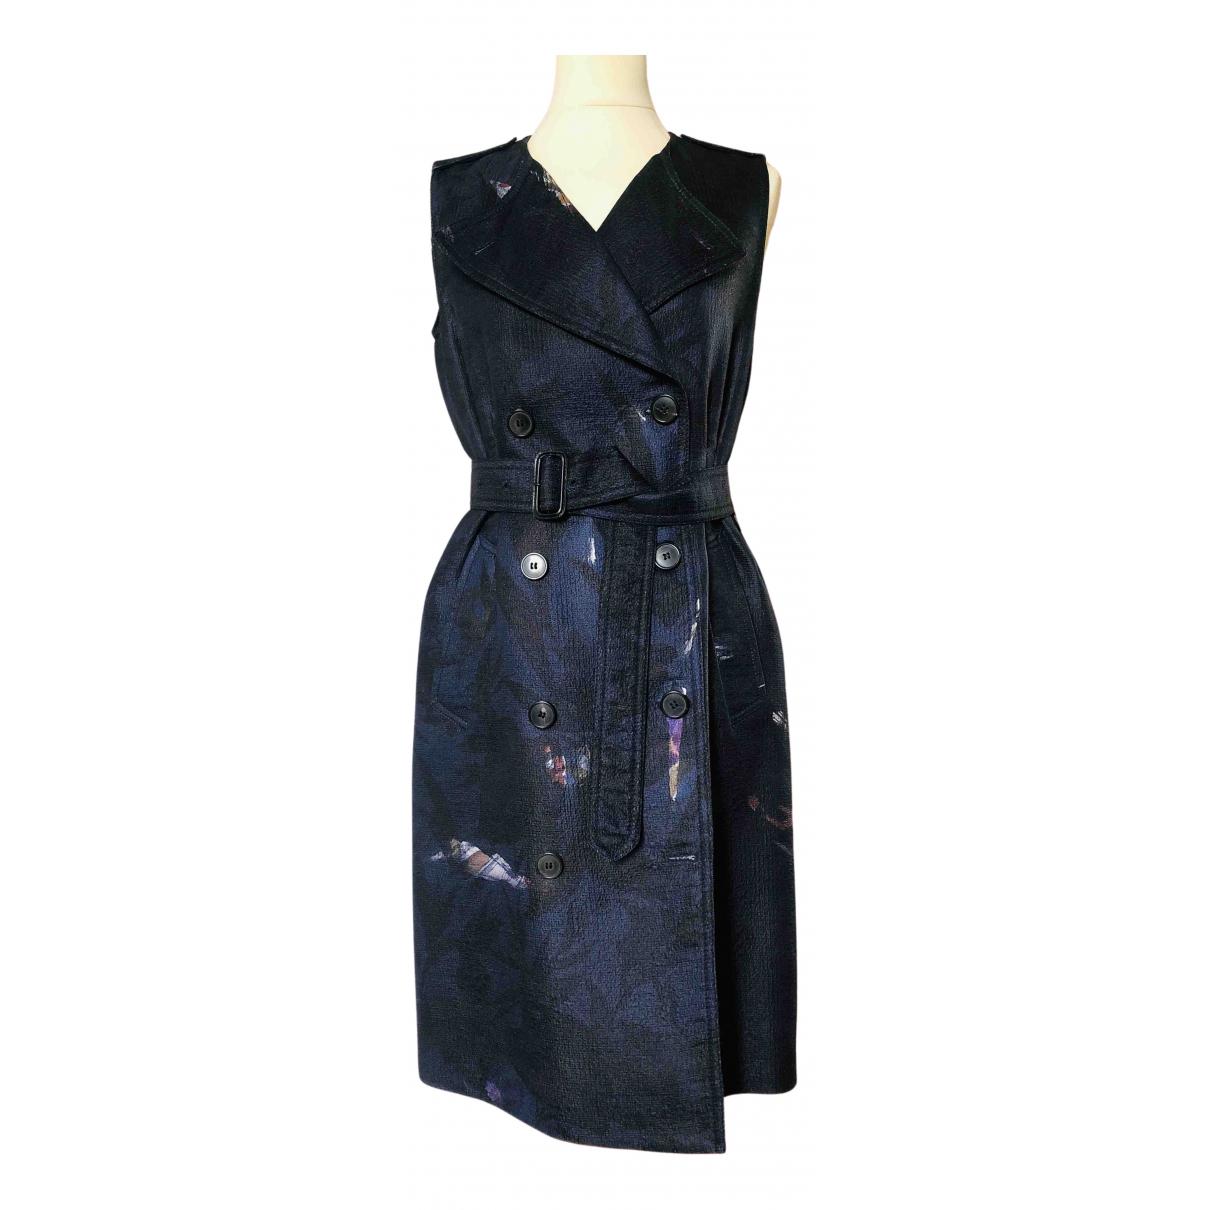 Dries Van Noten \N Kleid in  Schwarz Seide